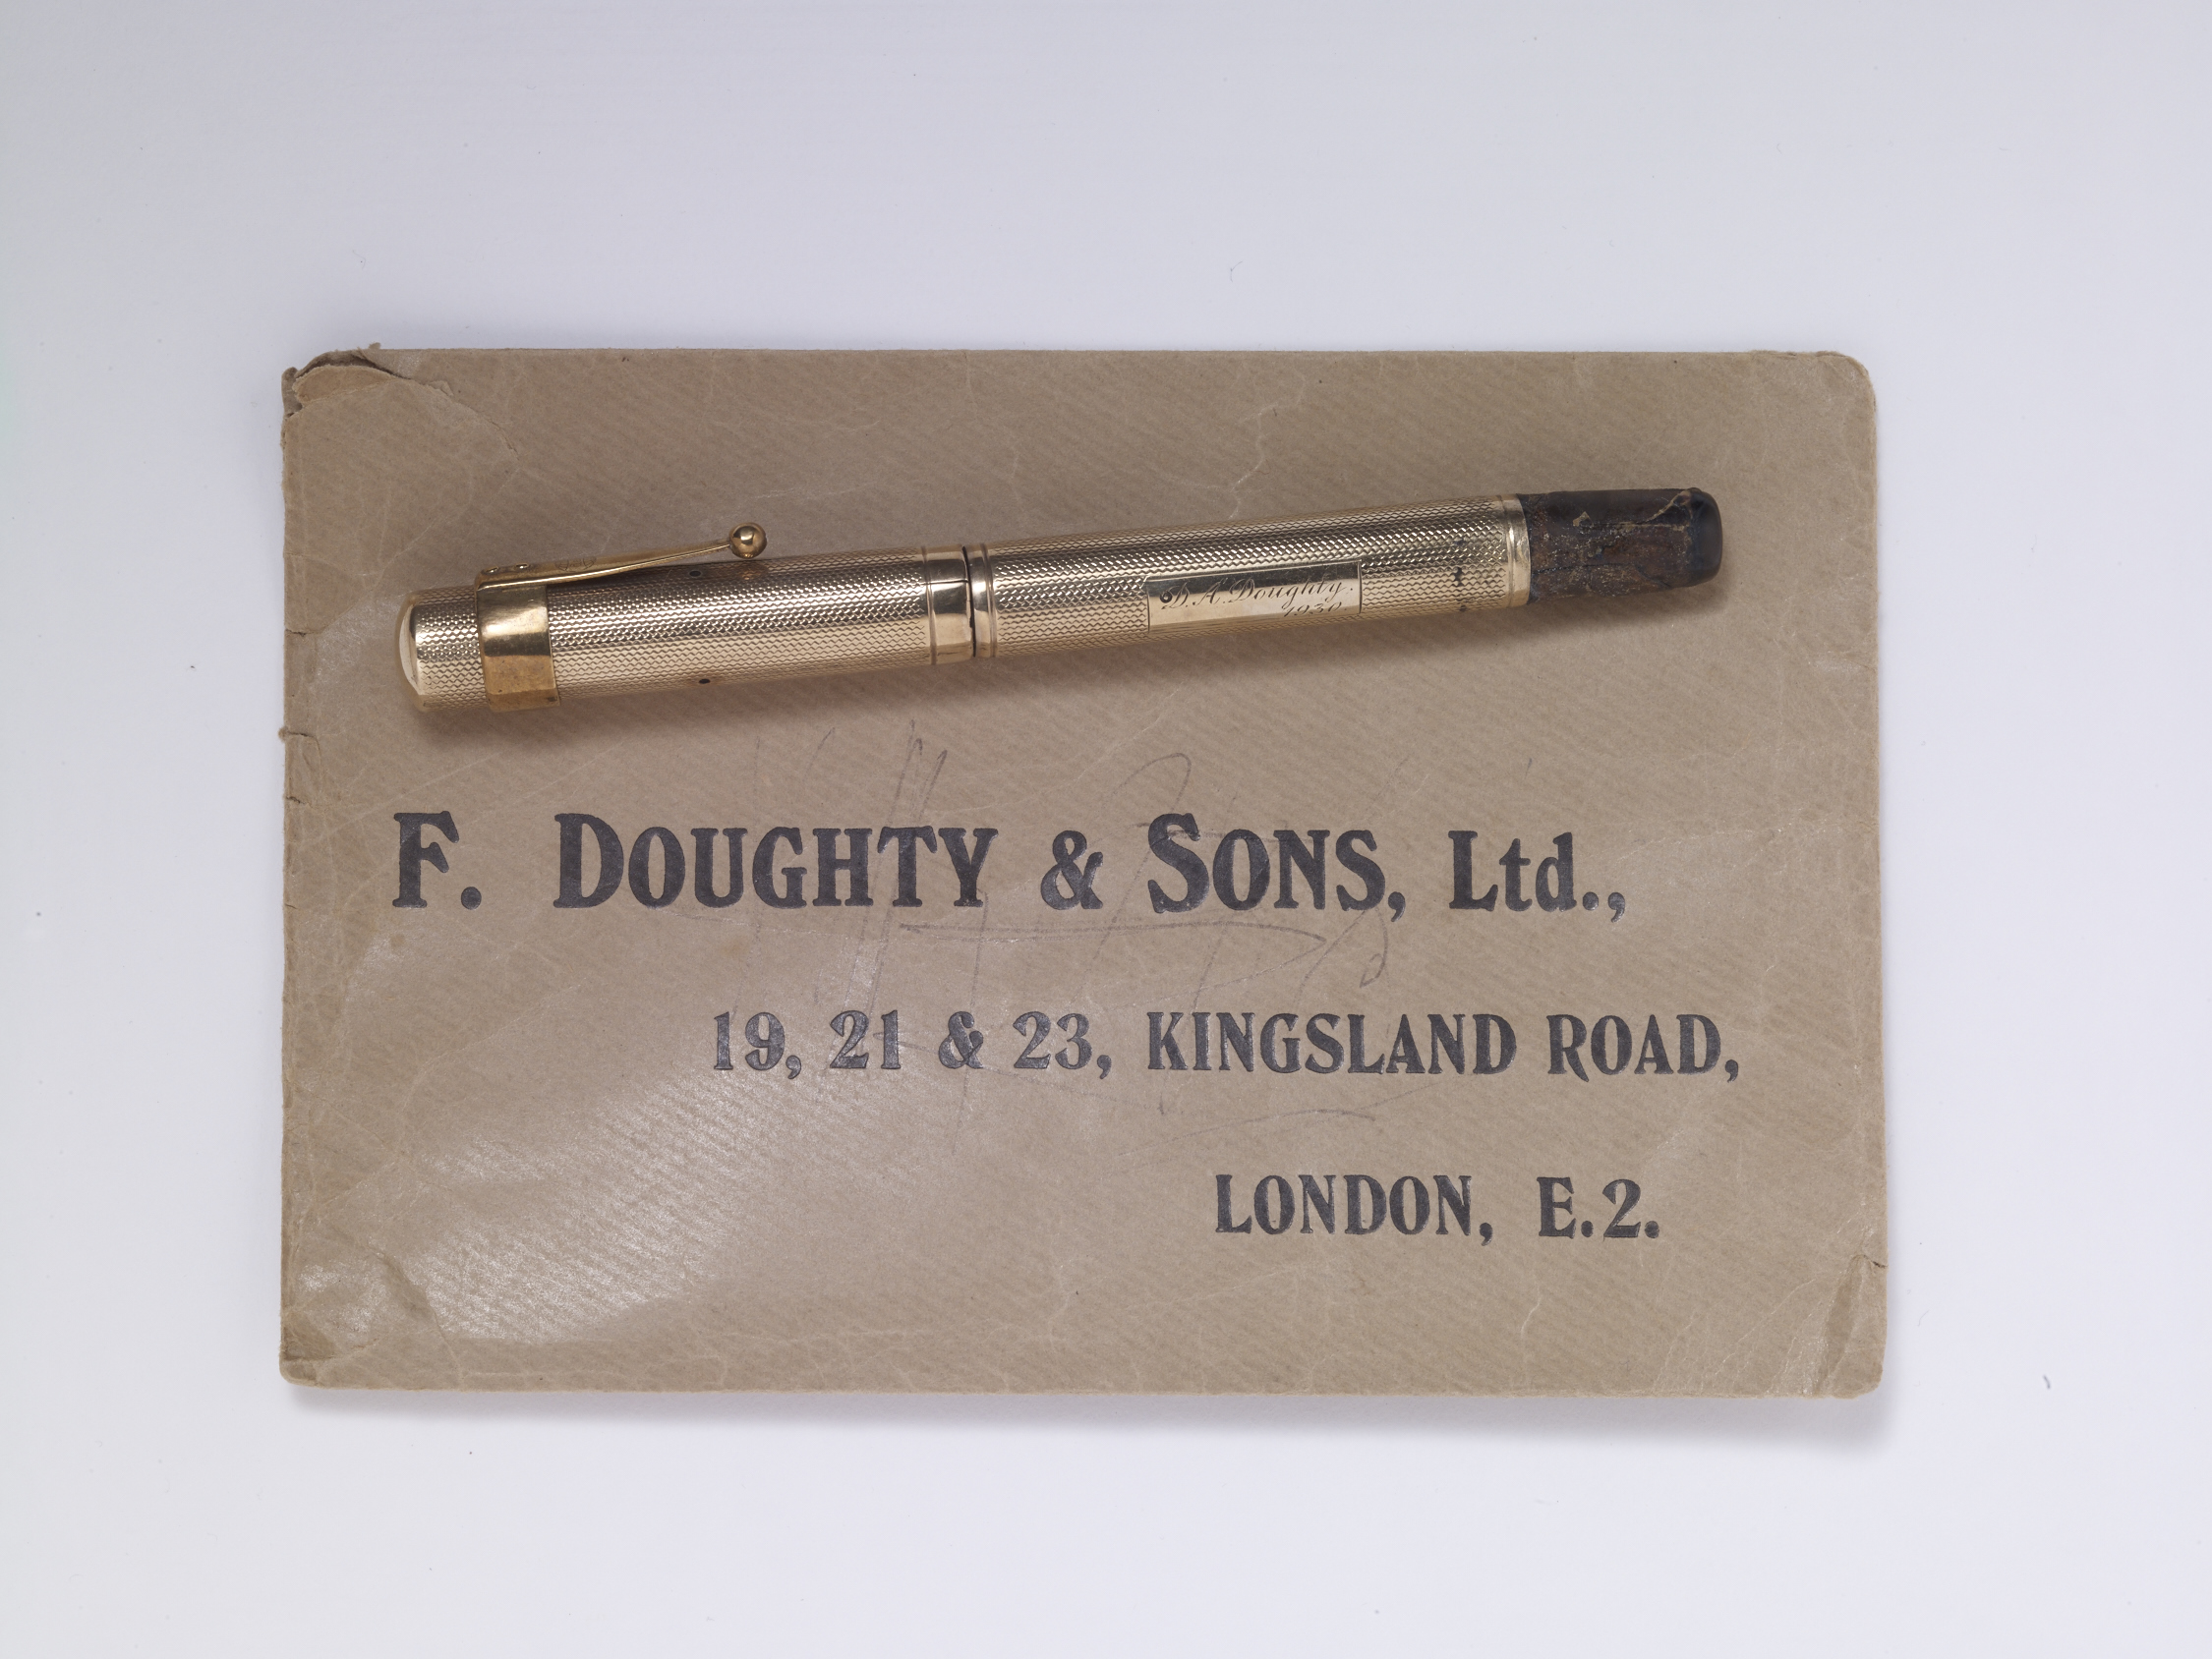 Donald Doughty